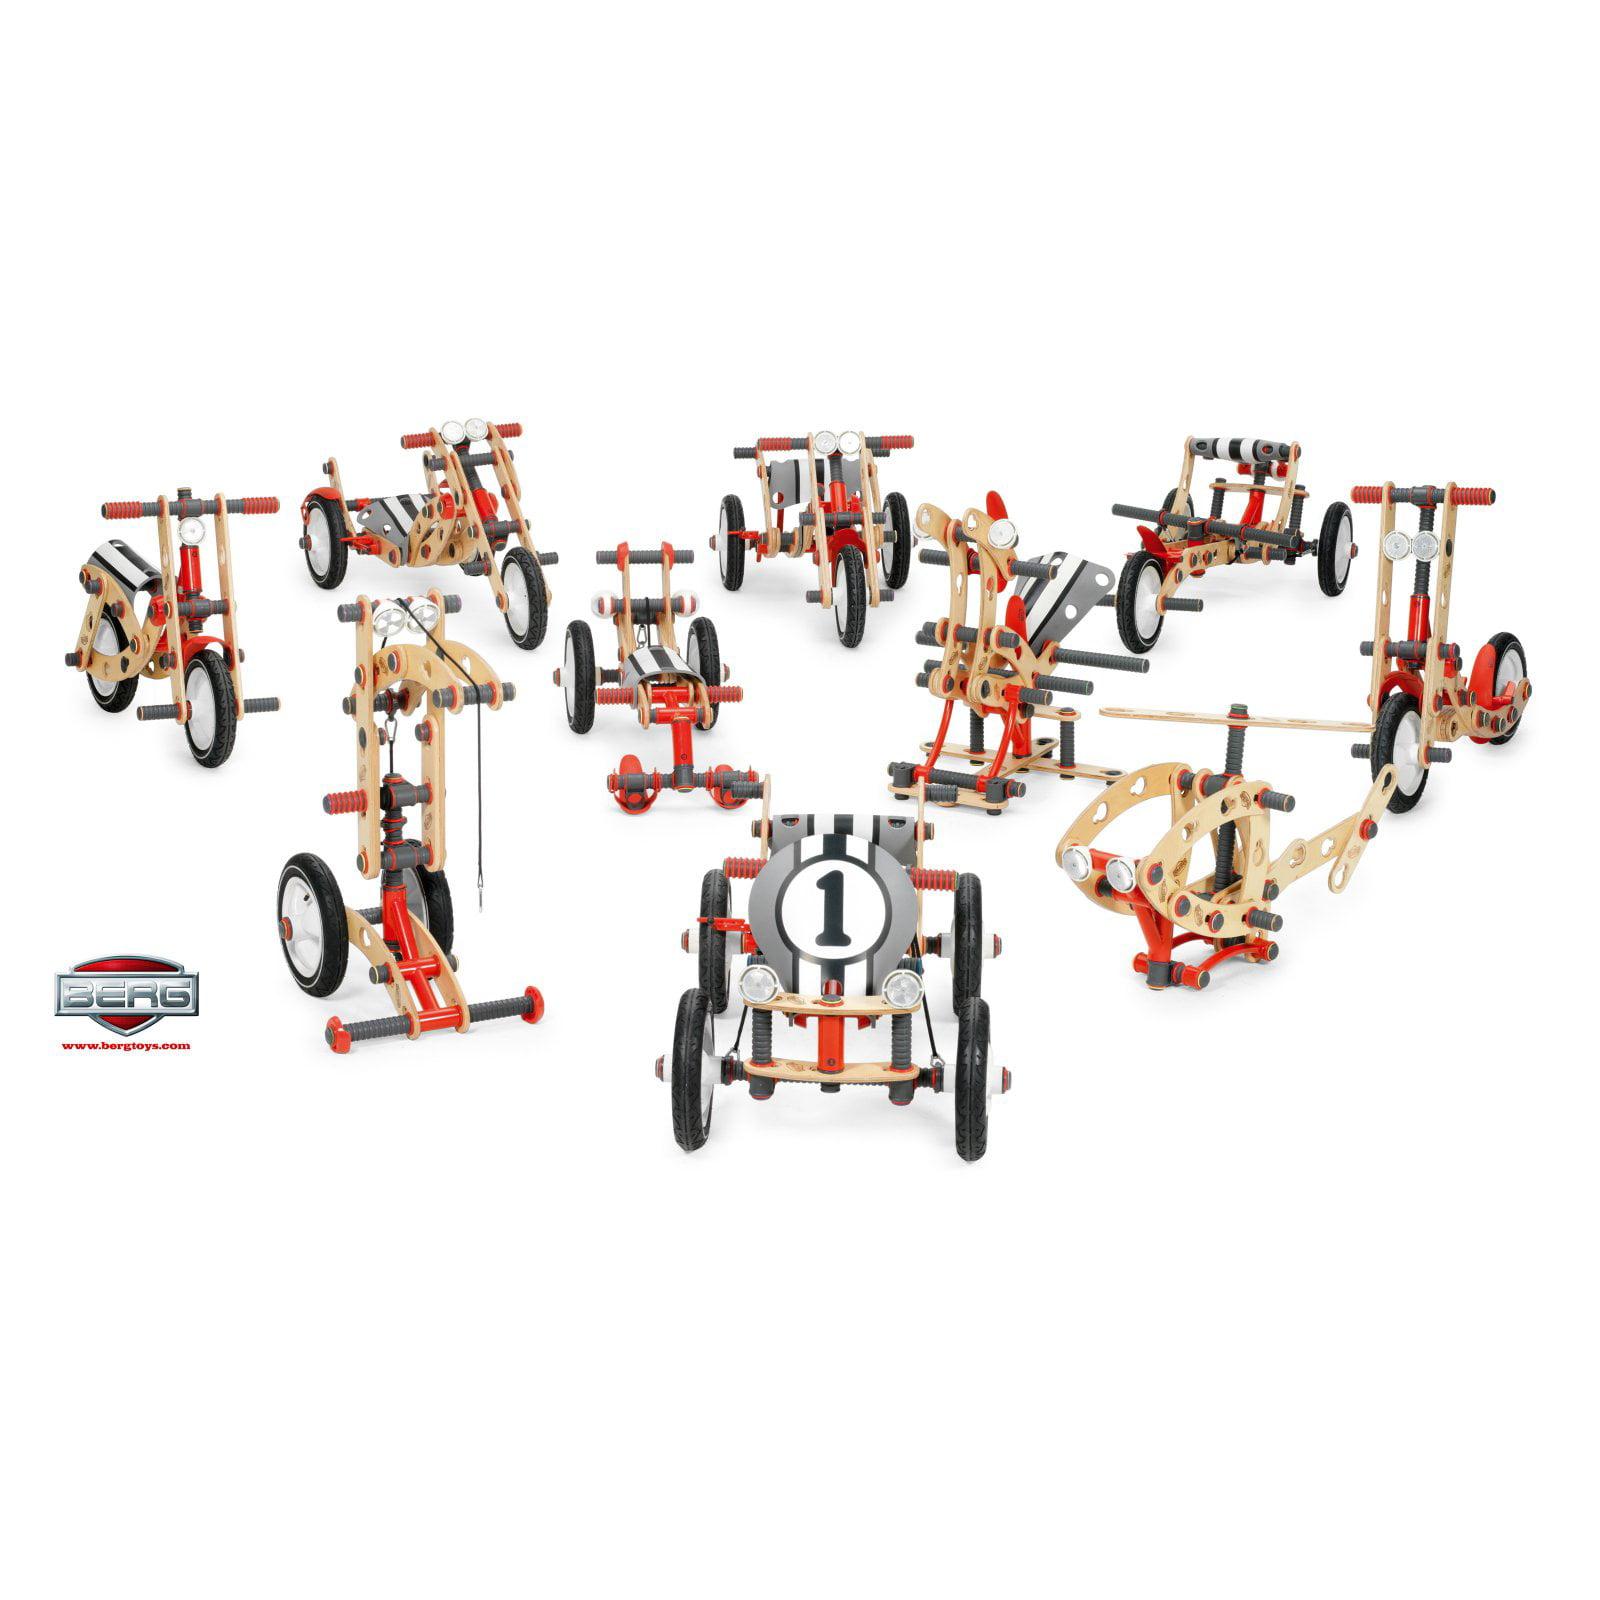 Berg USA Moov Street Kit Pedal Riding Toy